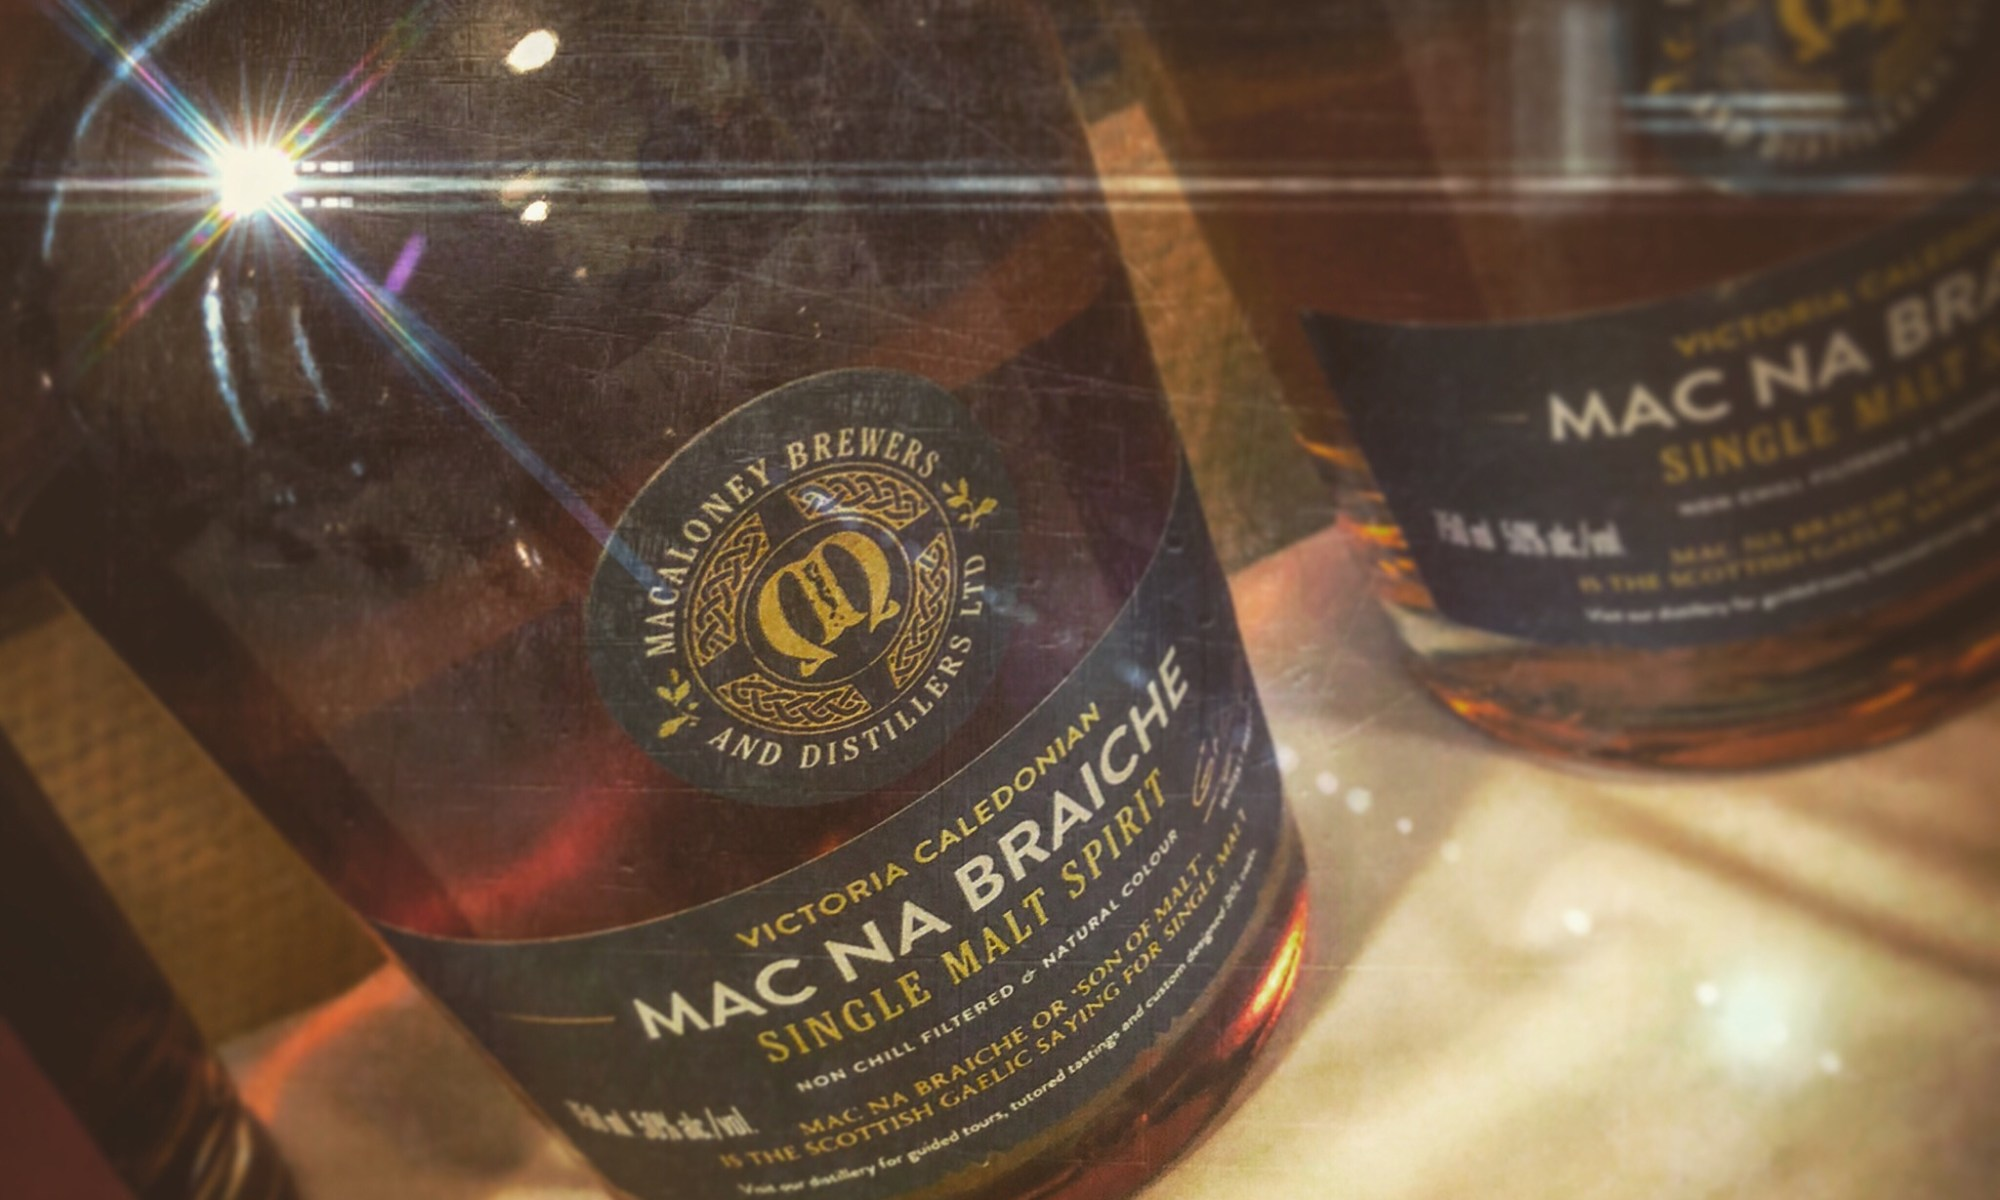 Vic Caledonian Mac na Braiche Single Malt